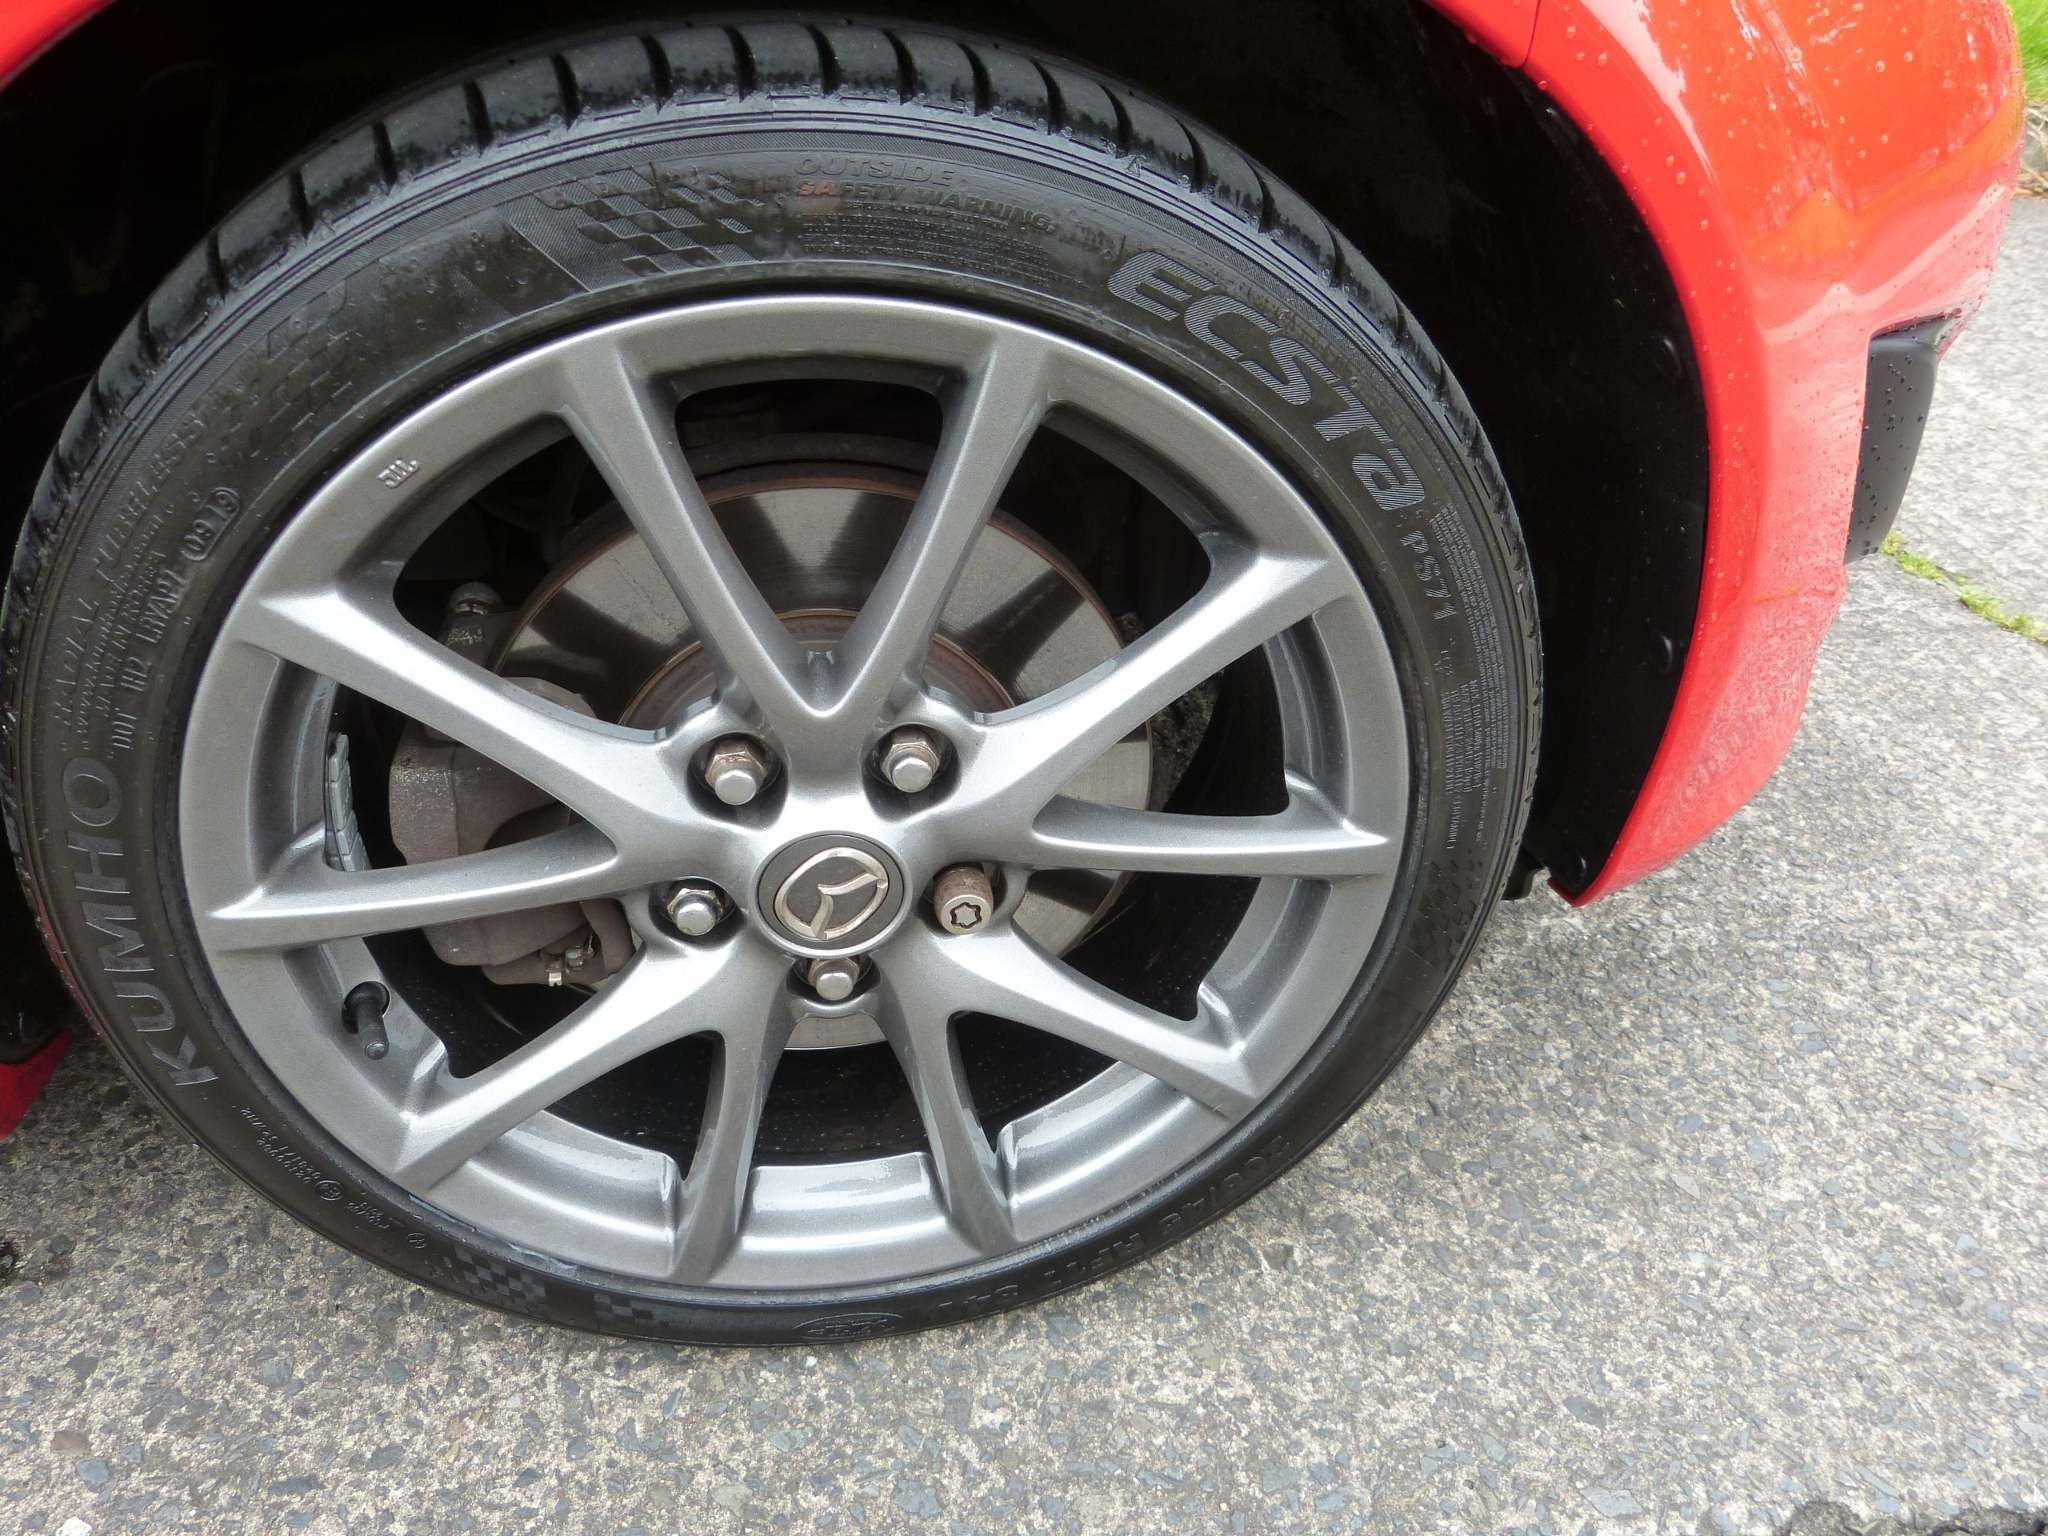 2012 MAZDA 5 MX- 2.0 Sport Tech Roadster Petrol Manual  – Beechlawn Motors Belfast full